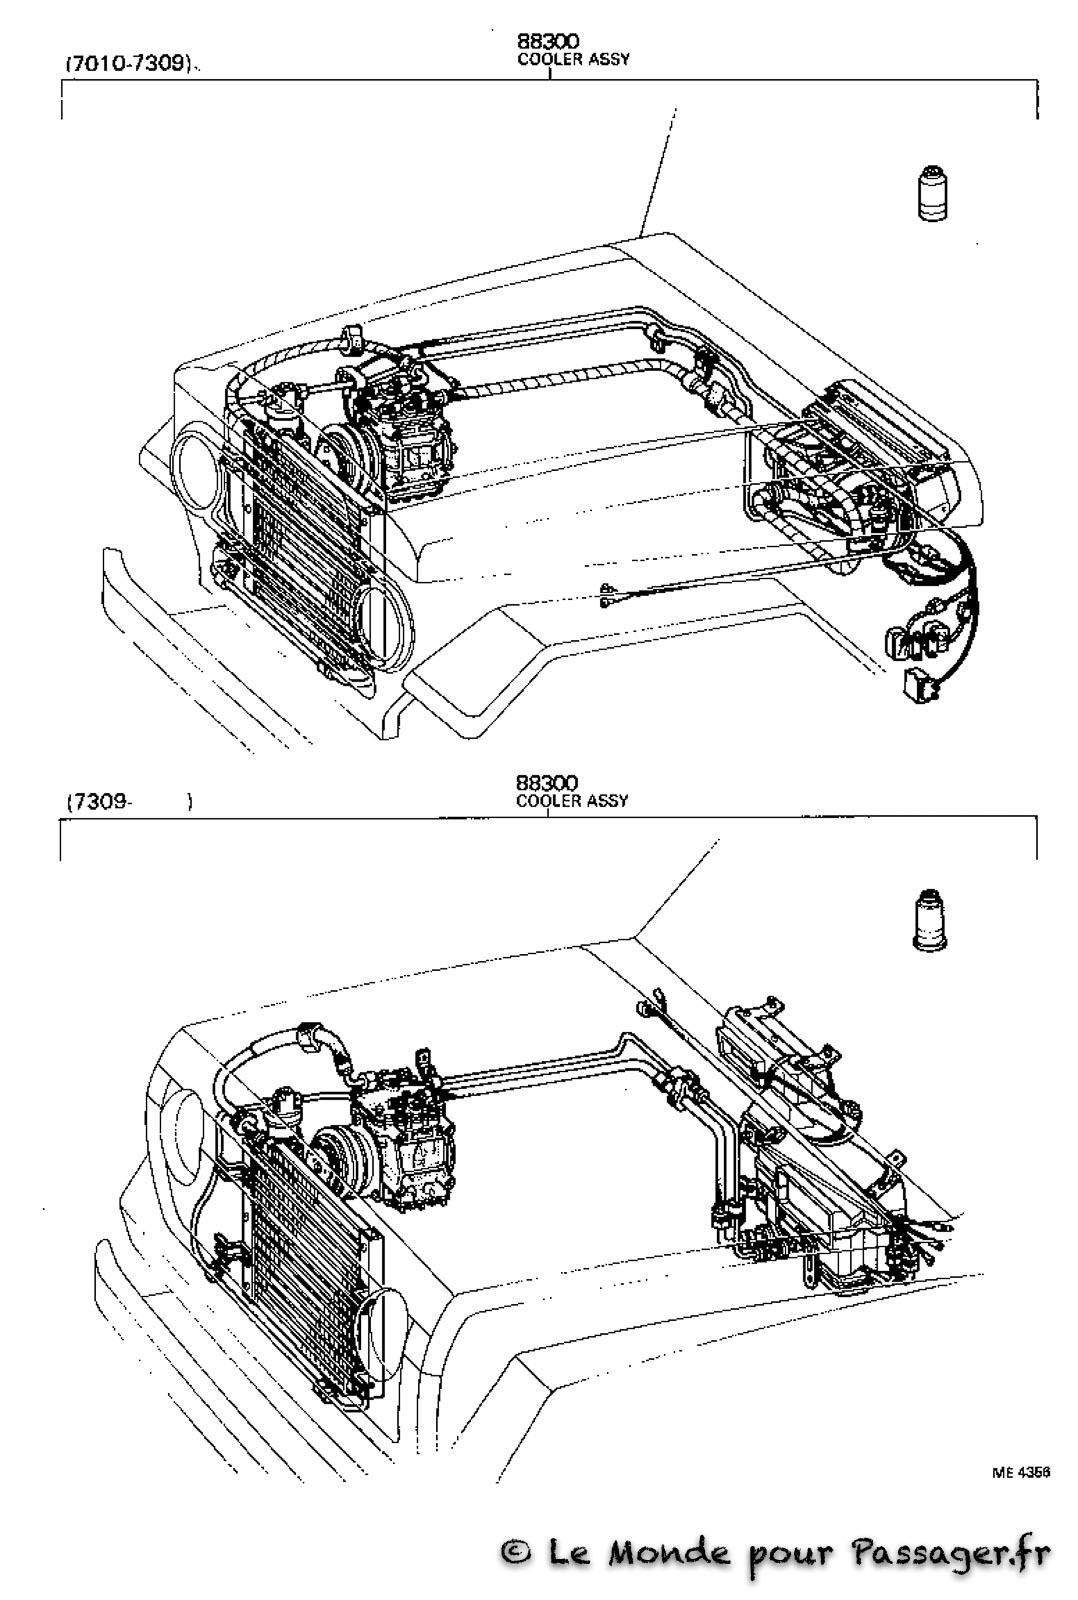 Fj55-Eclatés-Techniques143